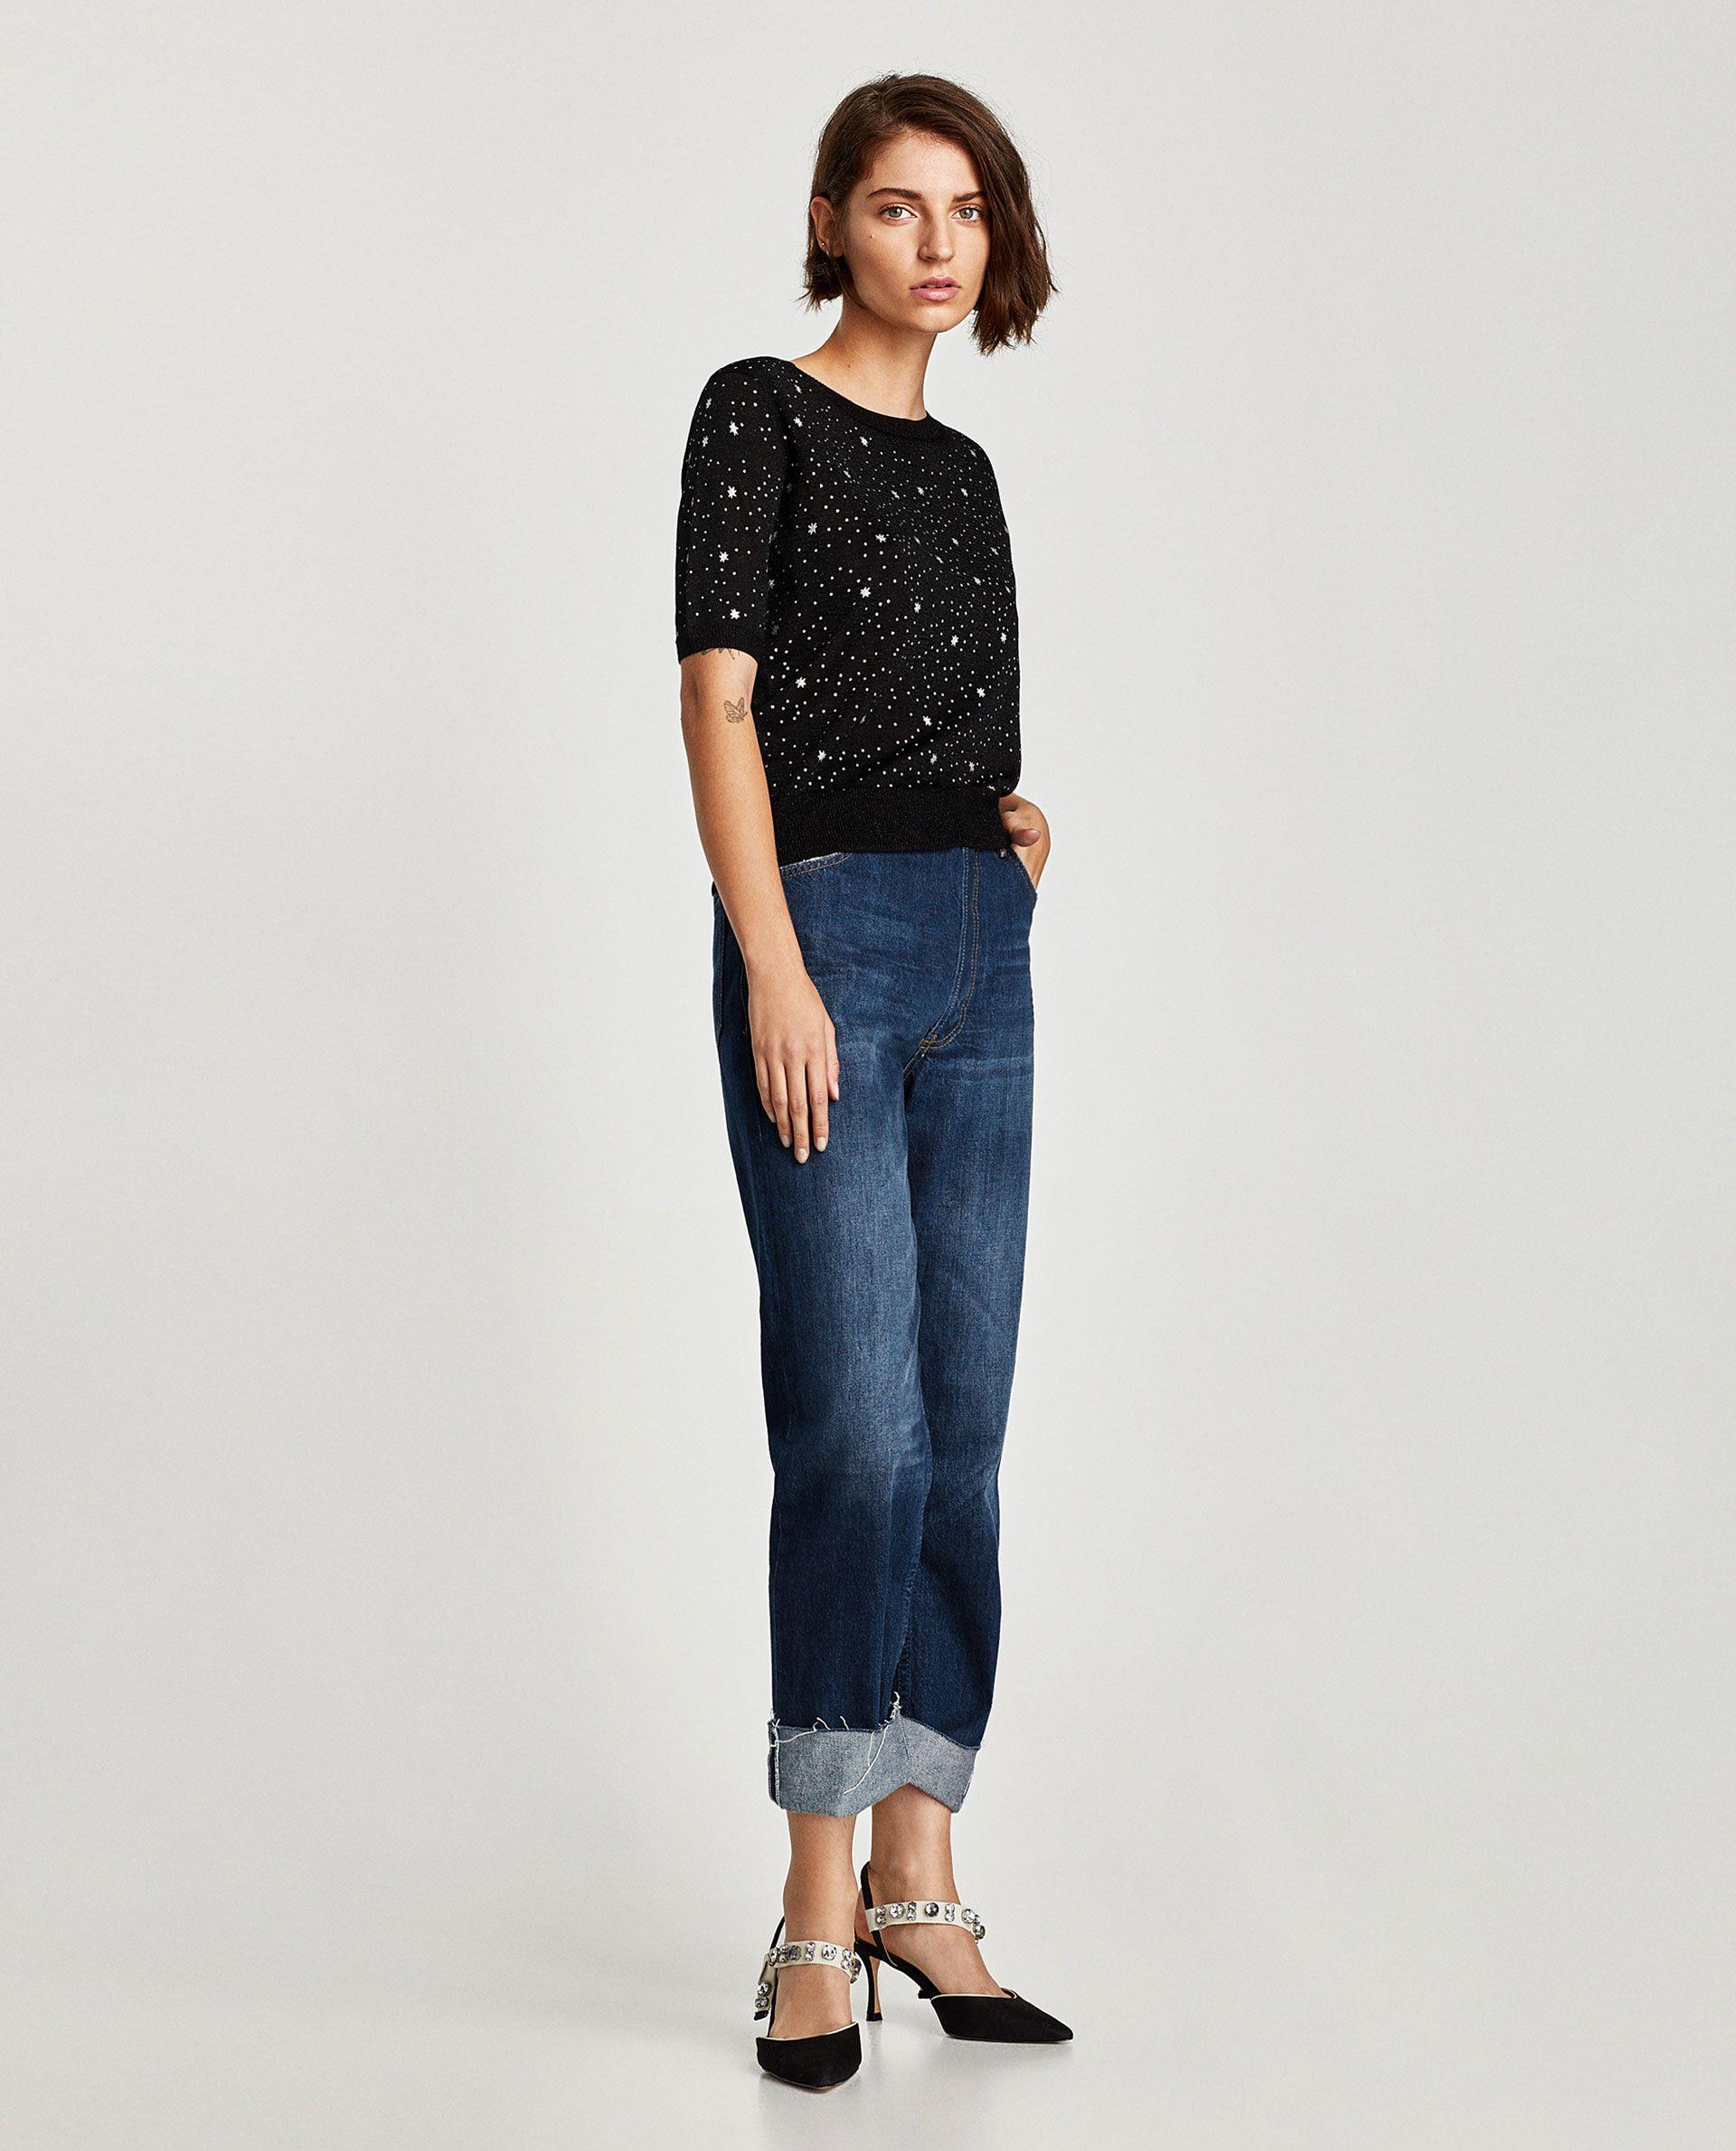 JERSEY MANGA CORTA ESTAMPADO   Fashion - Zara SS FW15   Pinterest ... 4b500594b0c